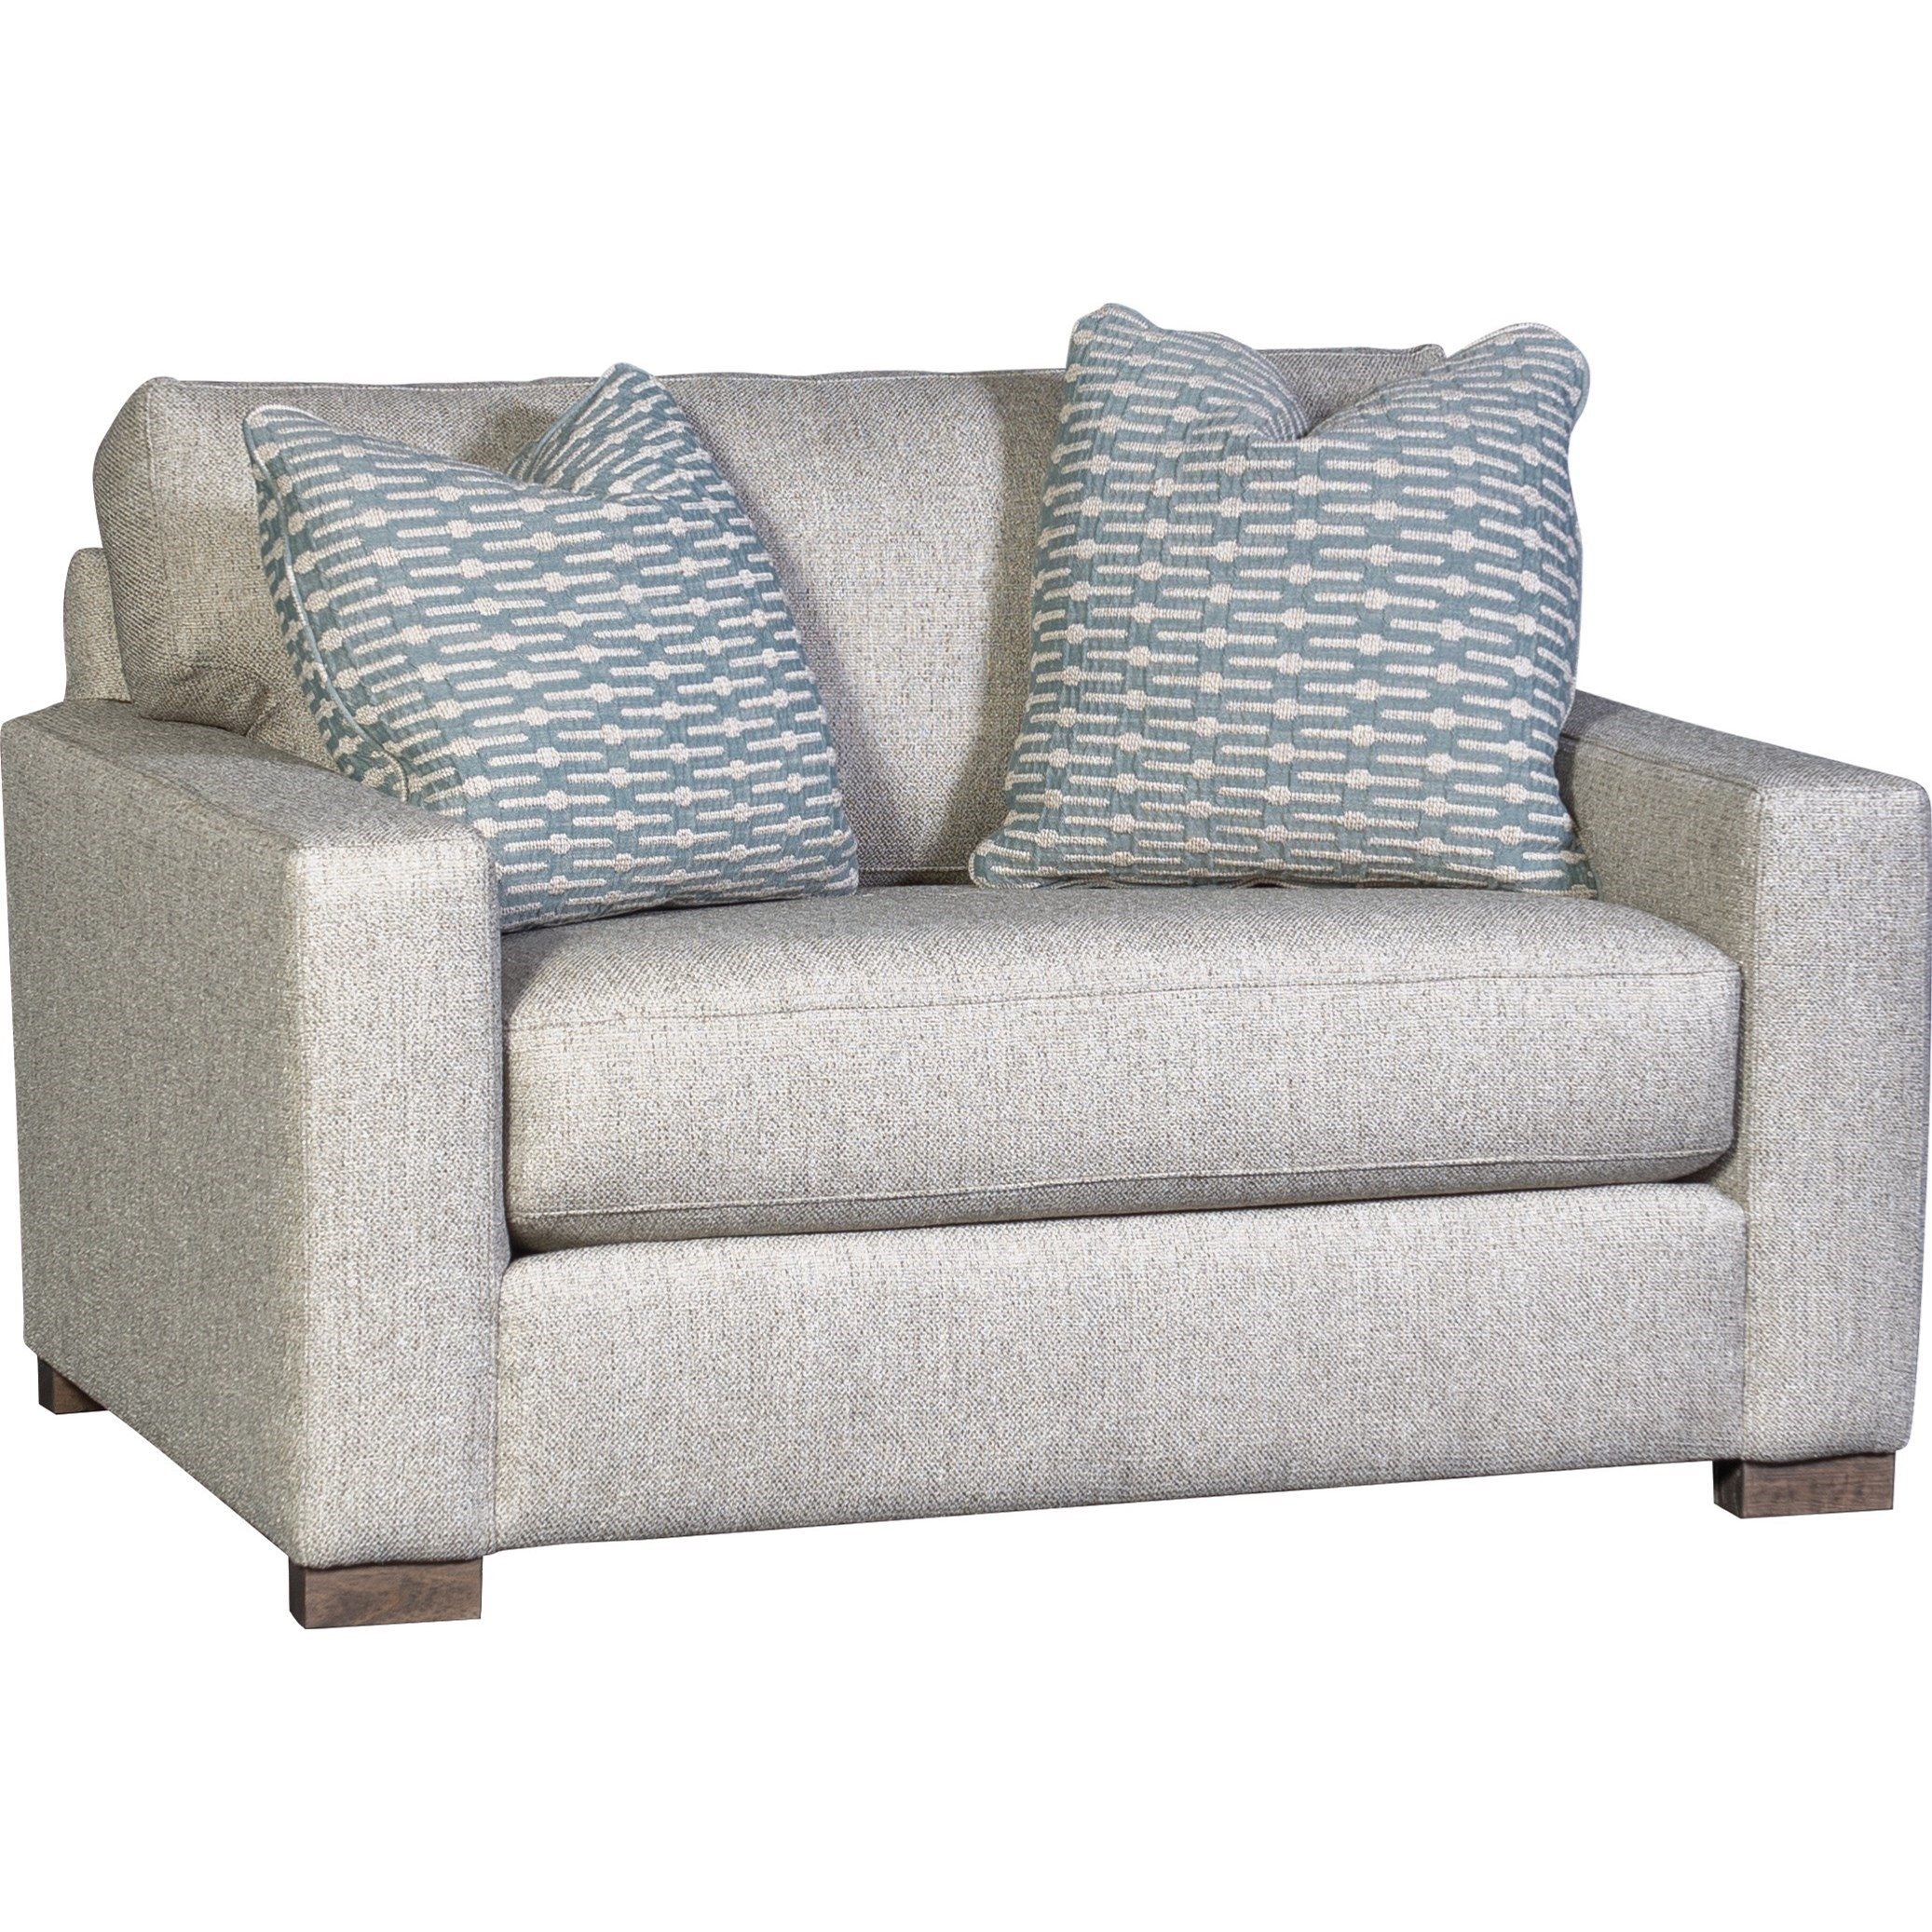 7101 Chair by Mayo at Pedigo Furniture